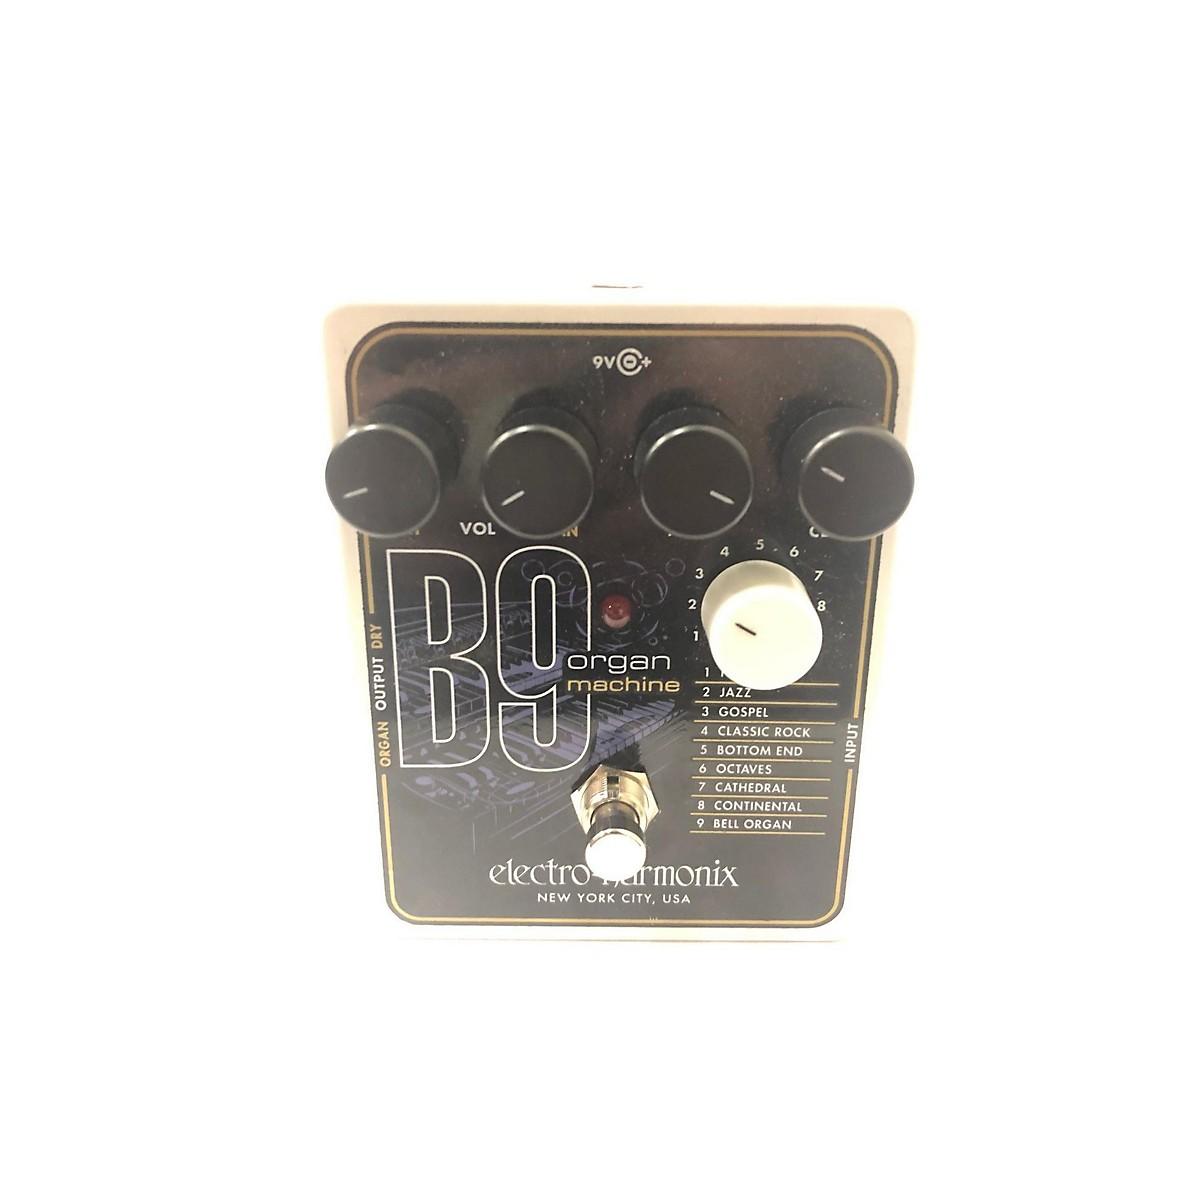 Electro-Harmonix B9 Organ Machine Effect Pedal